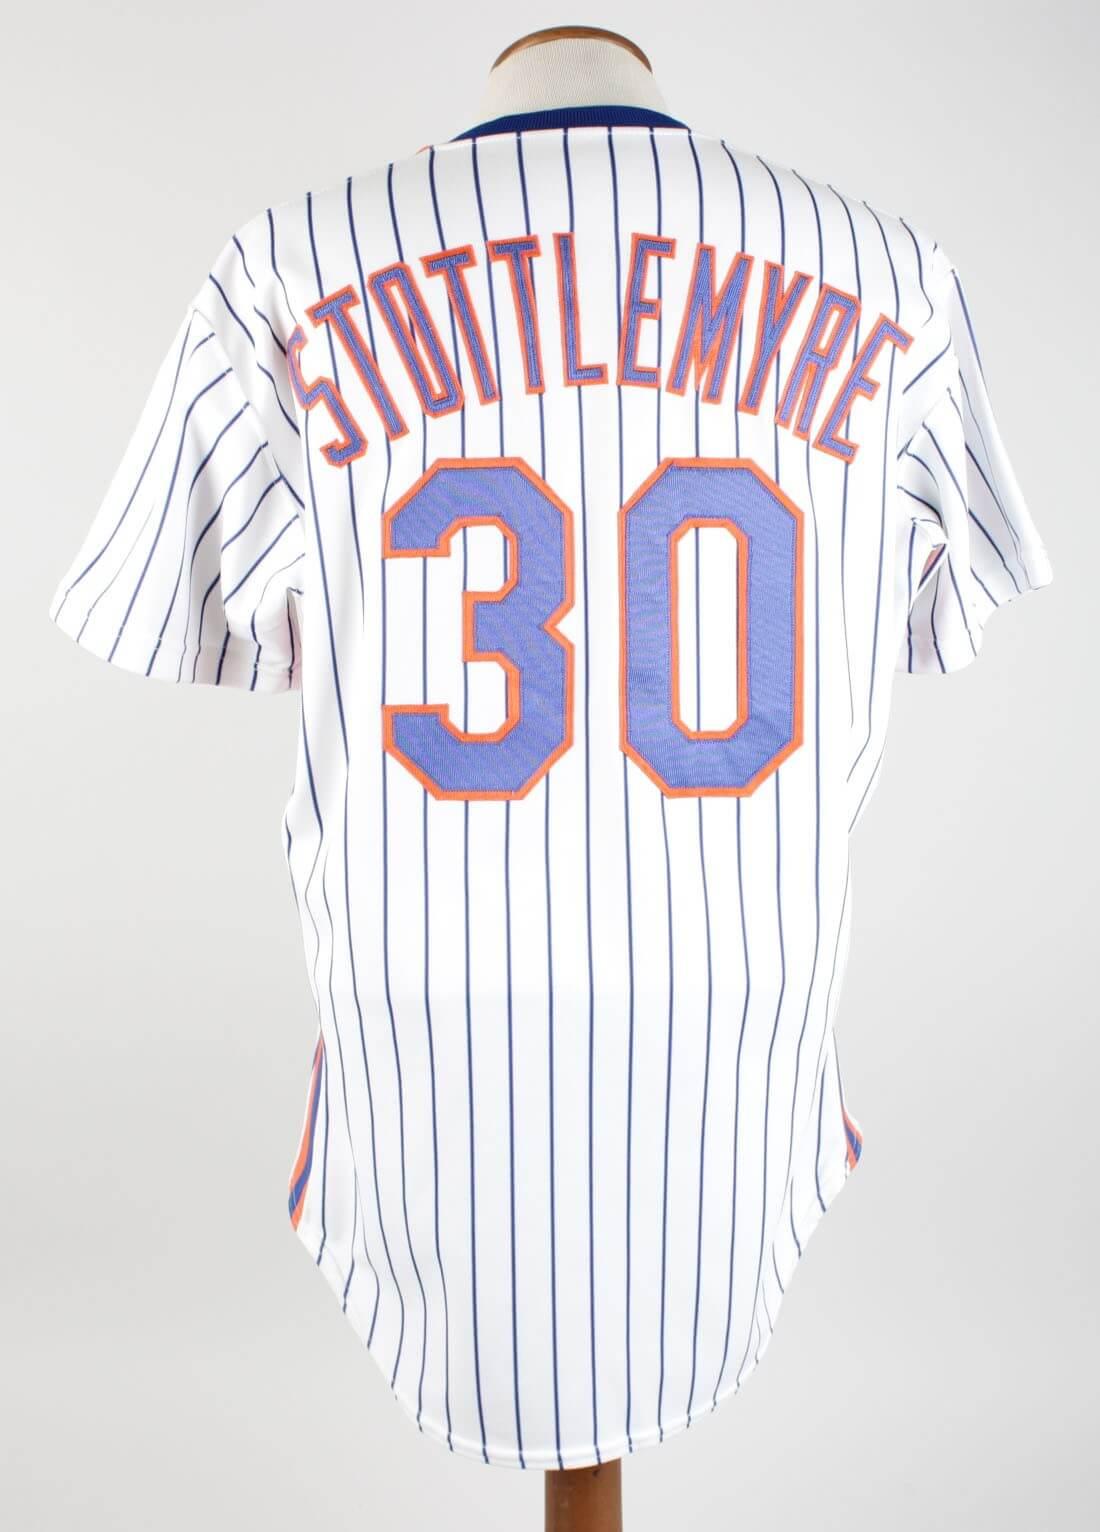 1990 Mel Stottlemyre Game-Worn Mets Coaching Jersey40031_01